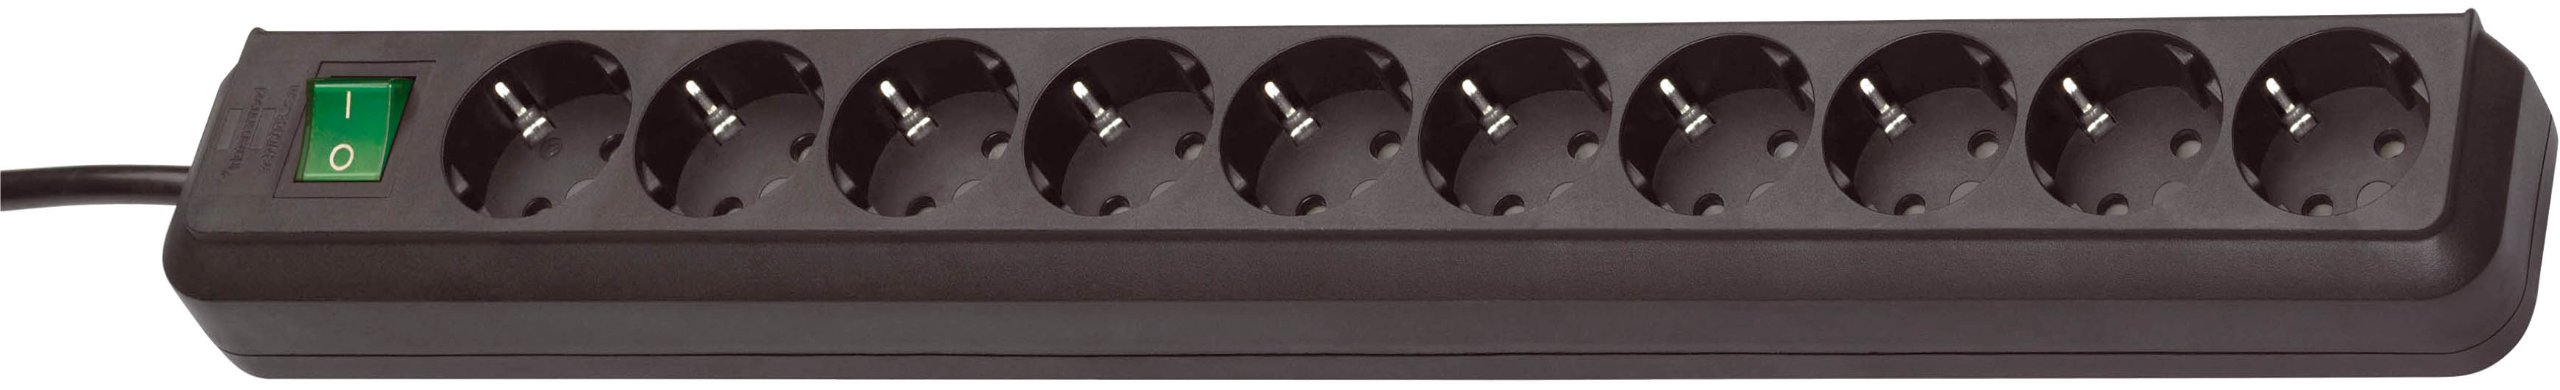 Brennenstuhl 1159300010 Regleta, 230 V, Negro, 50 cm product image